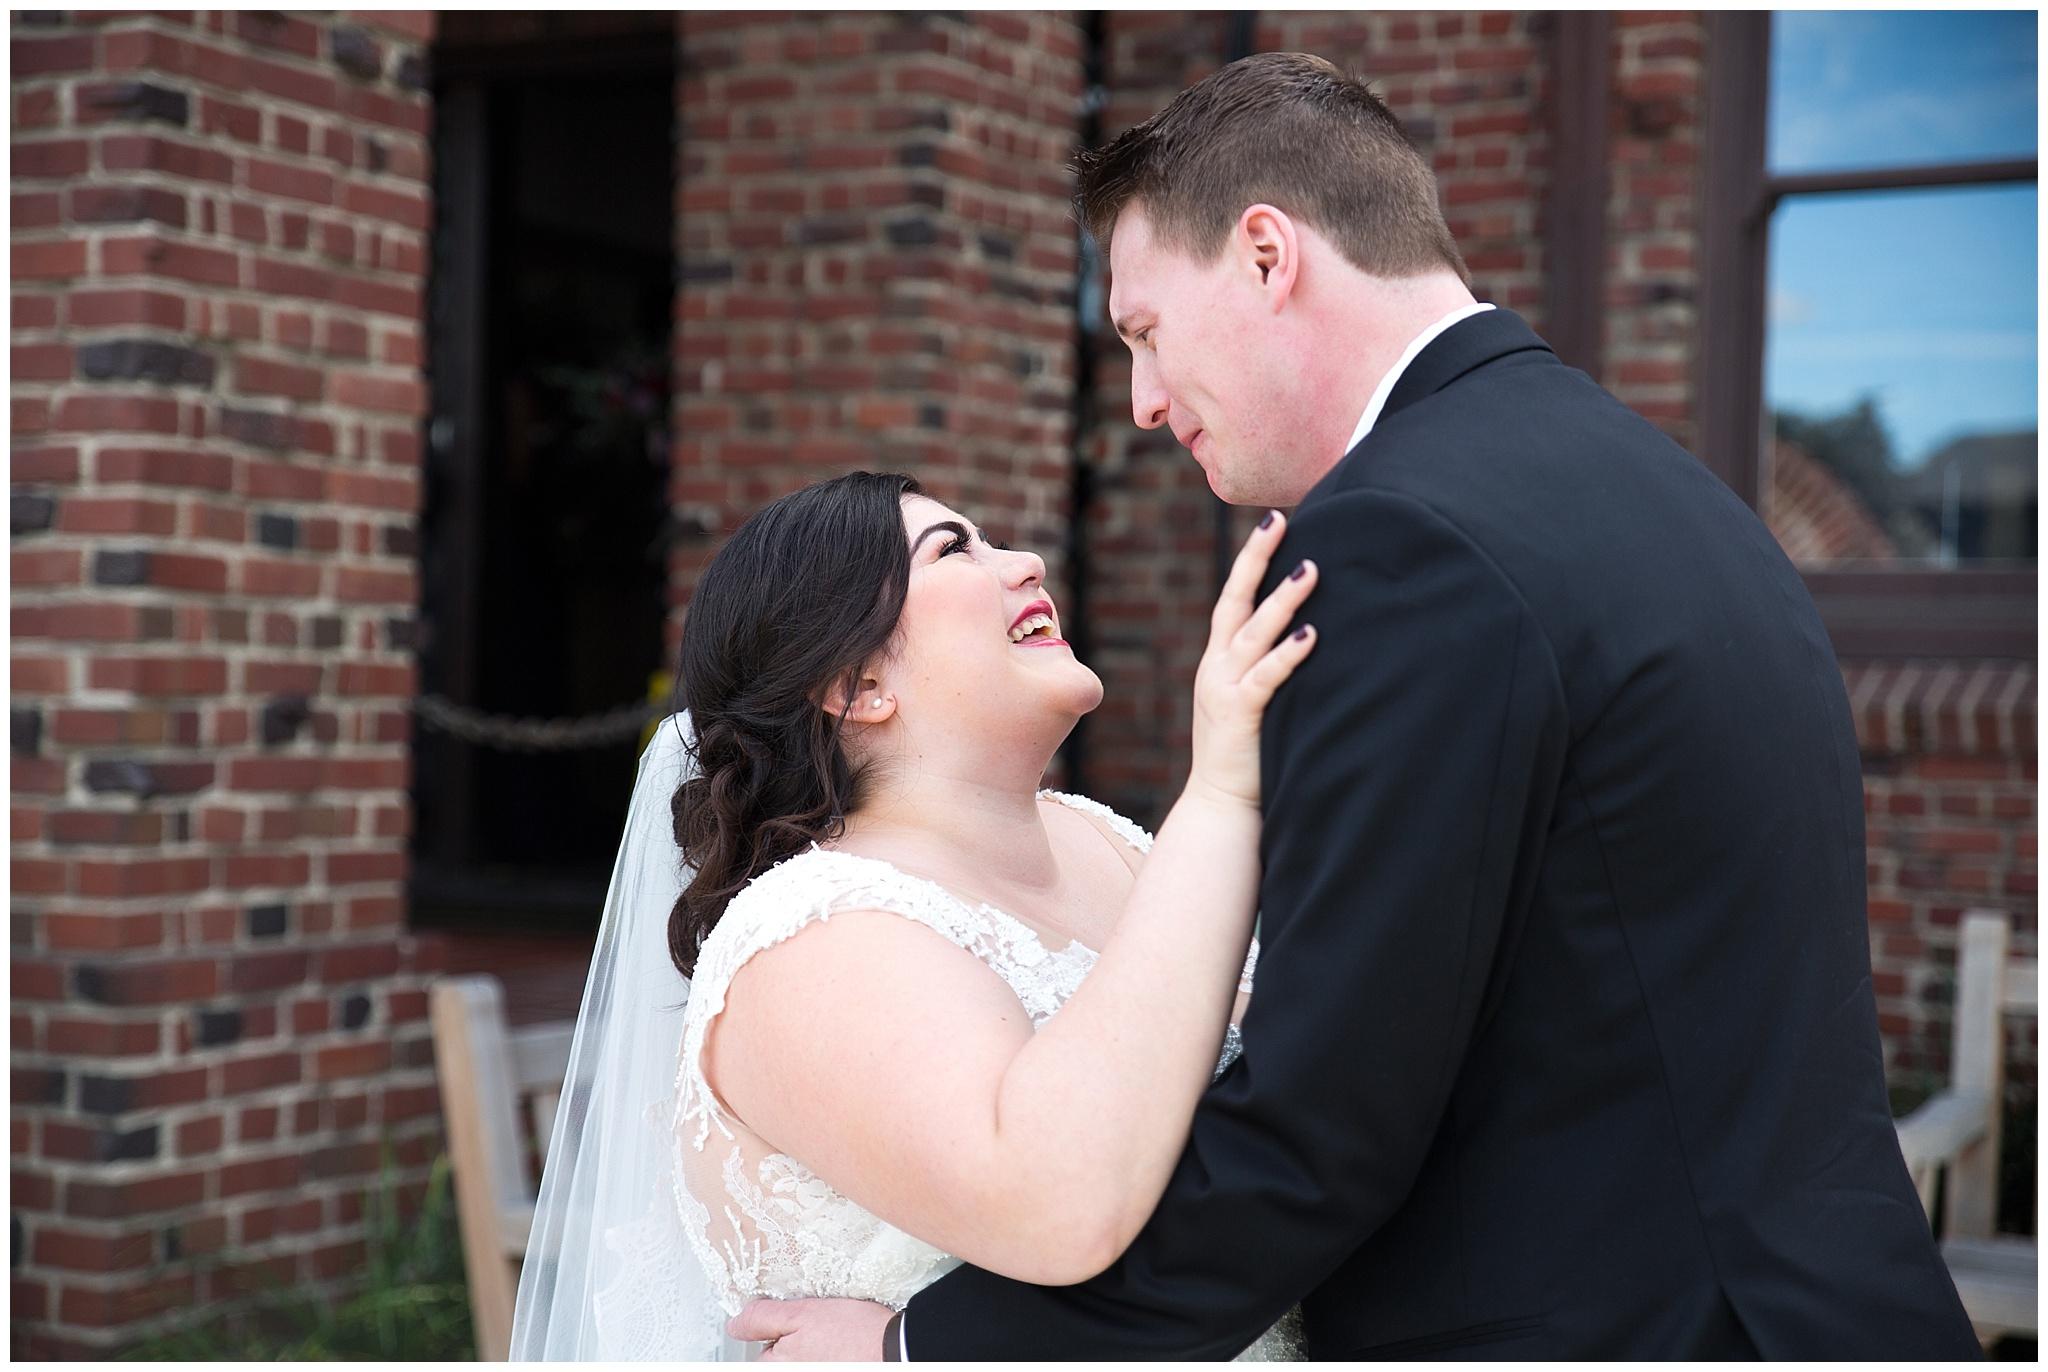 Carol_and_Grant_Wedding_3-3-18-7756.jpg